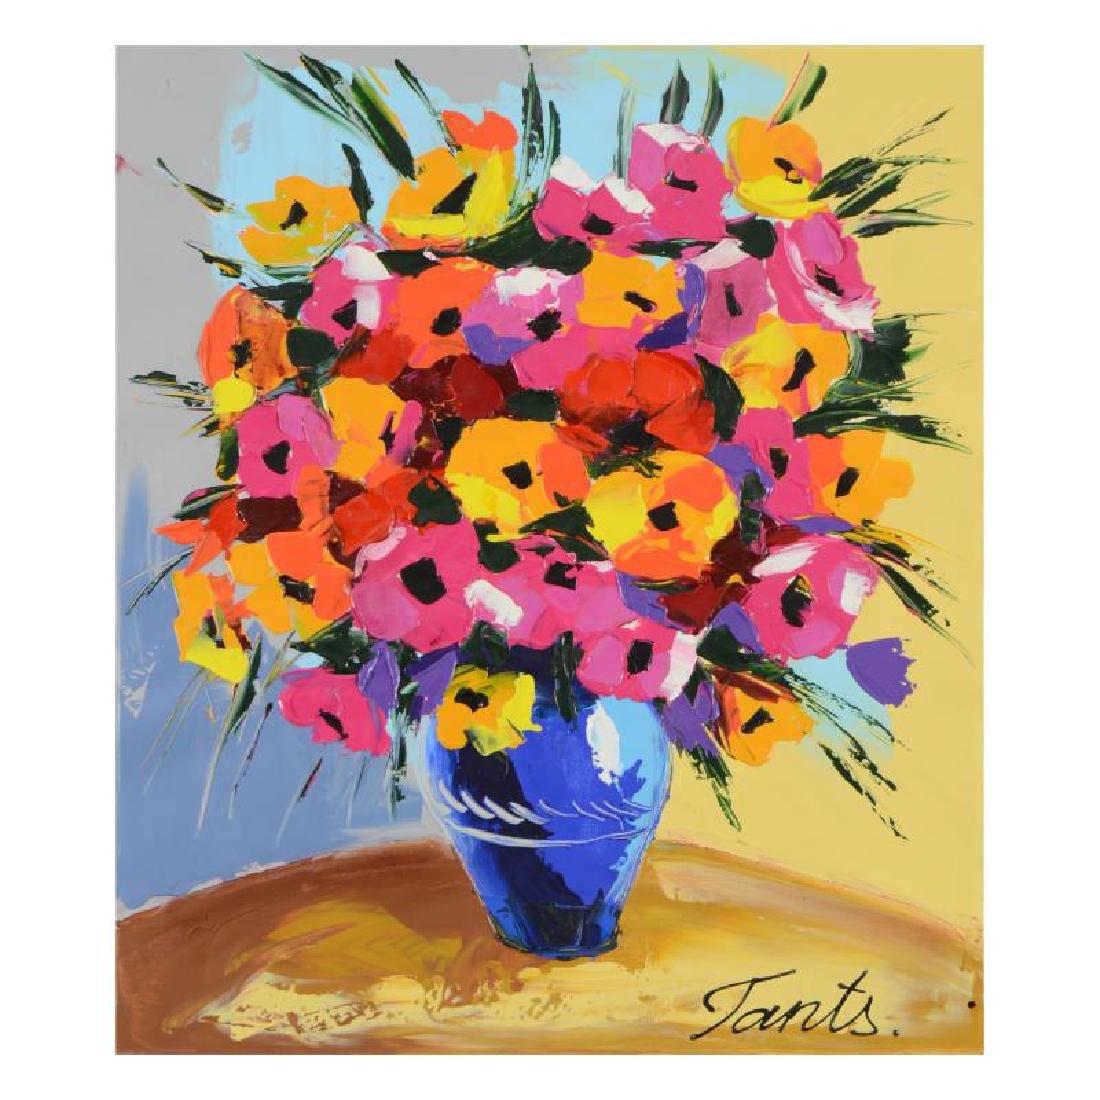 Lena Tants - Original Acrylic Painting on Canvas